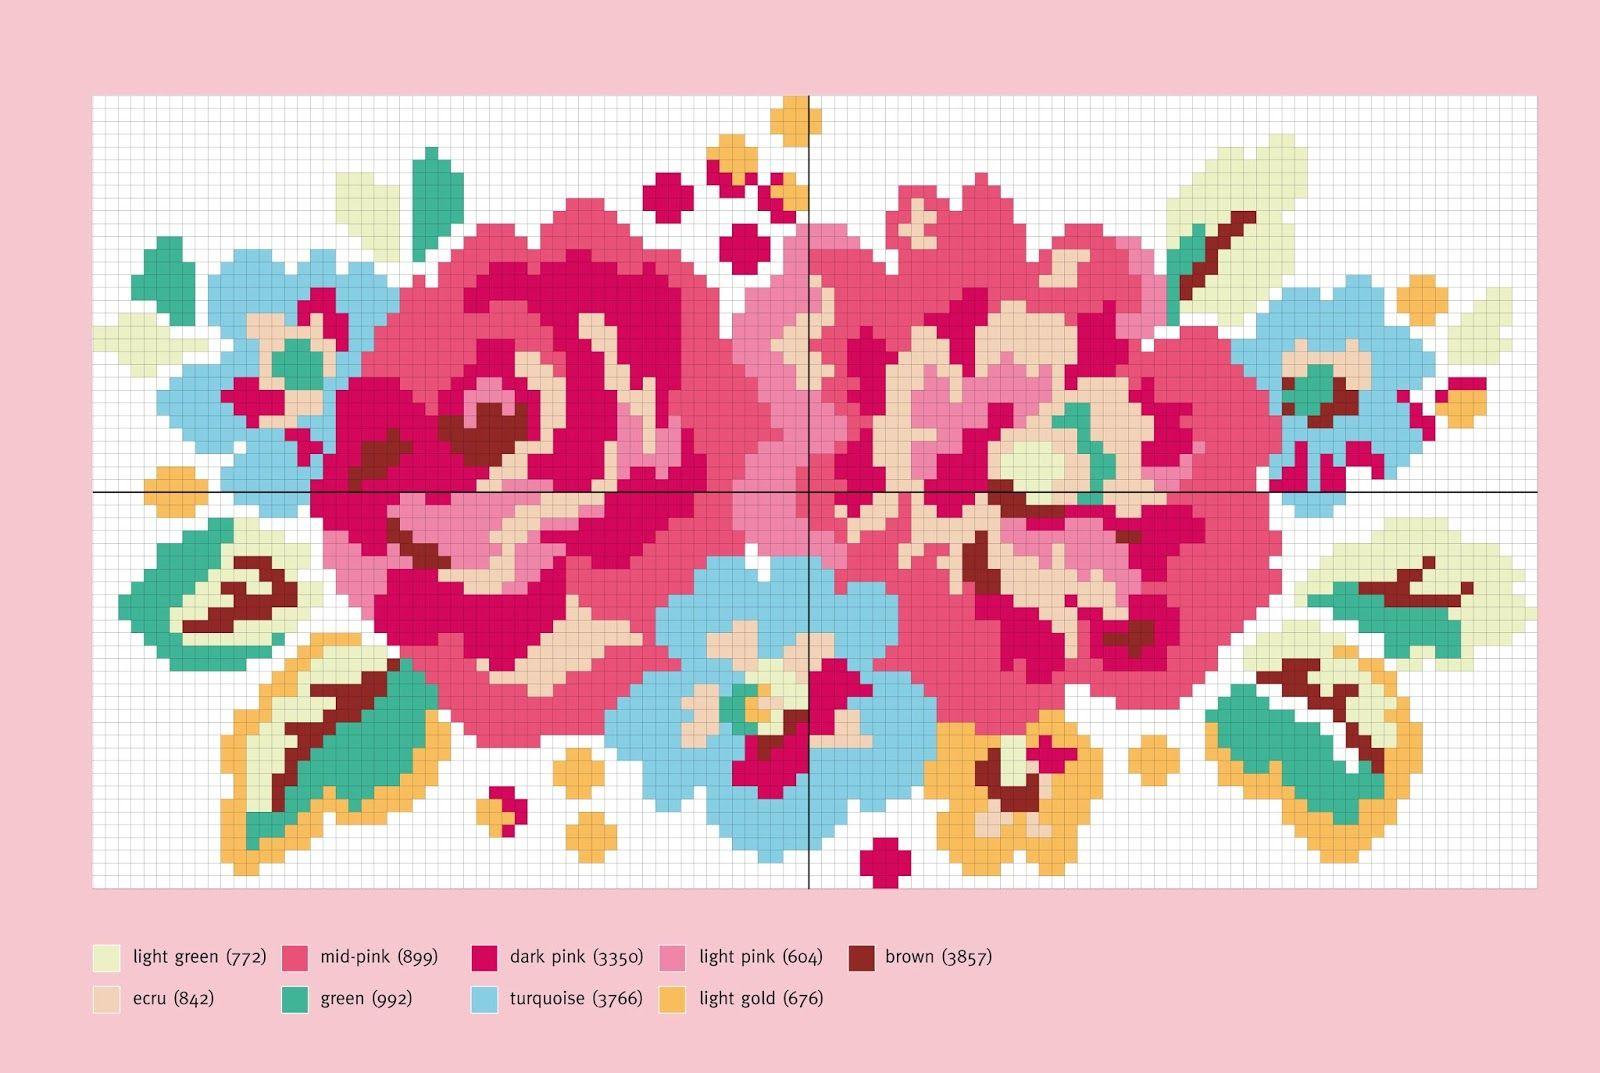 https://2.bp.blogspot.com/-fS0eh7vpviQ/Uguhf8ke9WI/AAAAAAAAfKk/QoBHB3qmogs/s1600/grille-coussin-fleuri.jpg